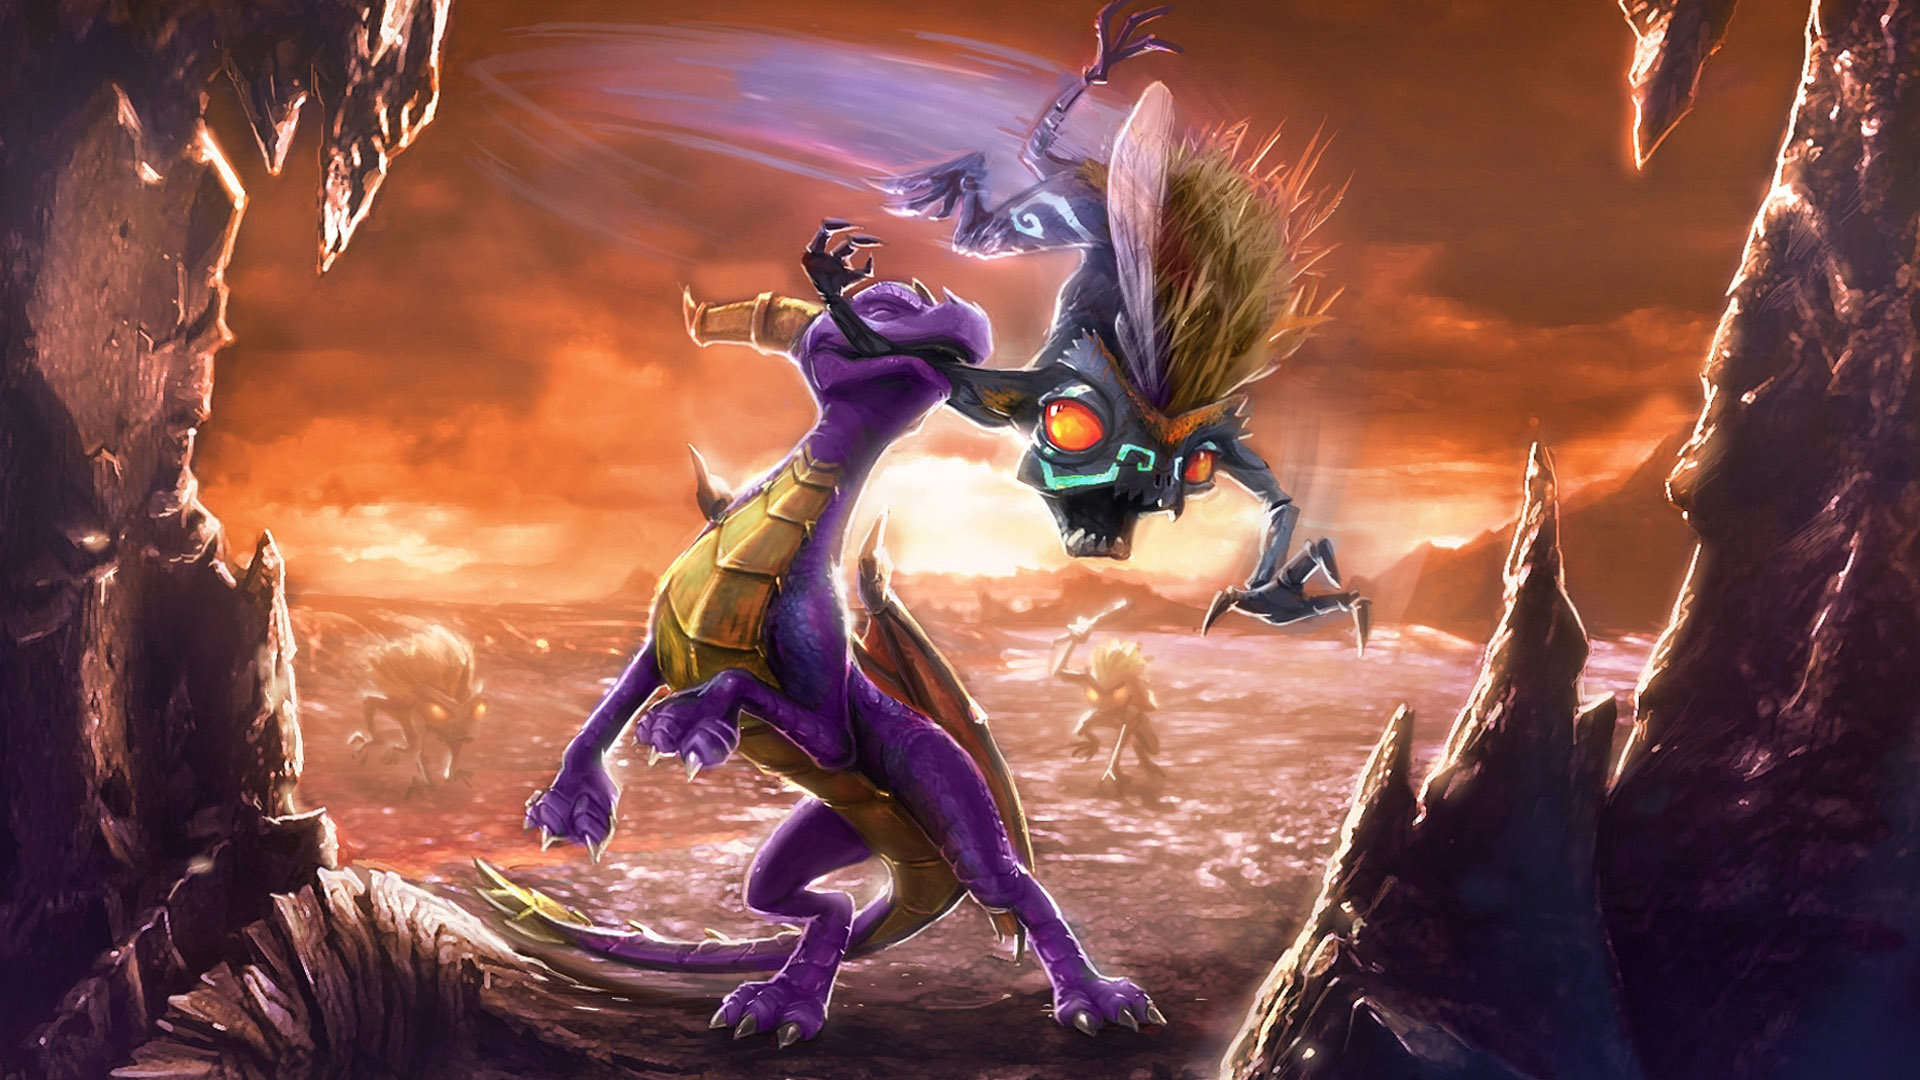 Free Spyro The Dragon High Quality Wallpaper ID231527 For Hd 1080p Desktop